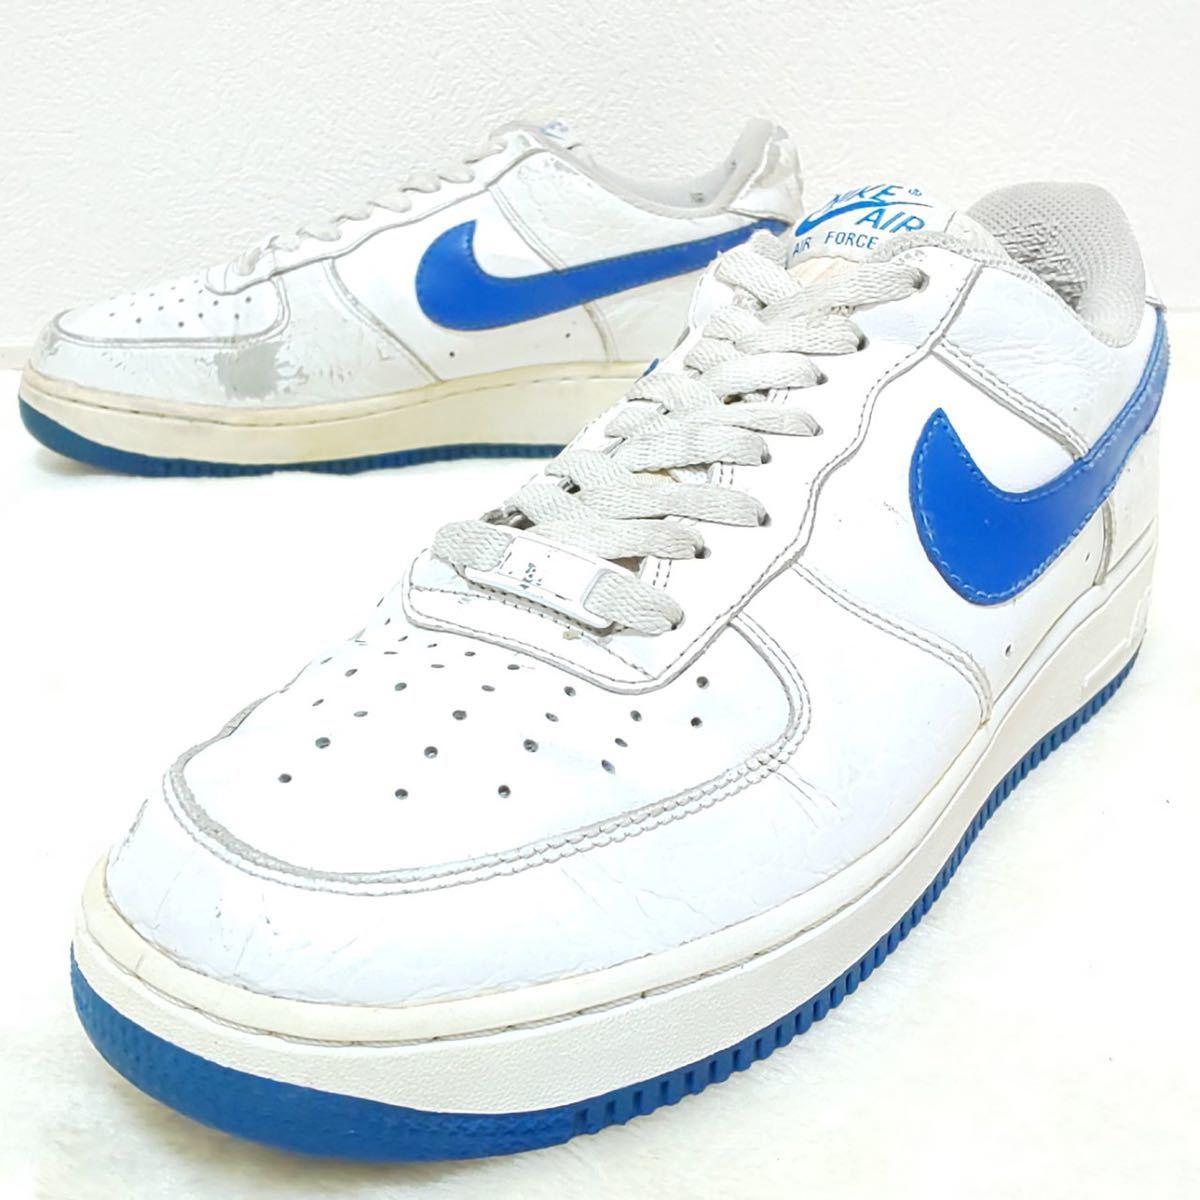 '07【NIKE】ナイキ AIR FORCE1 エアーフォースワン ローカット スニーカー シューズ 靴 ホワイト ブルー カジュアル ストリート 25.5cm/jx